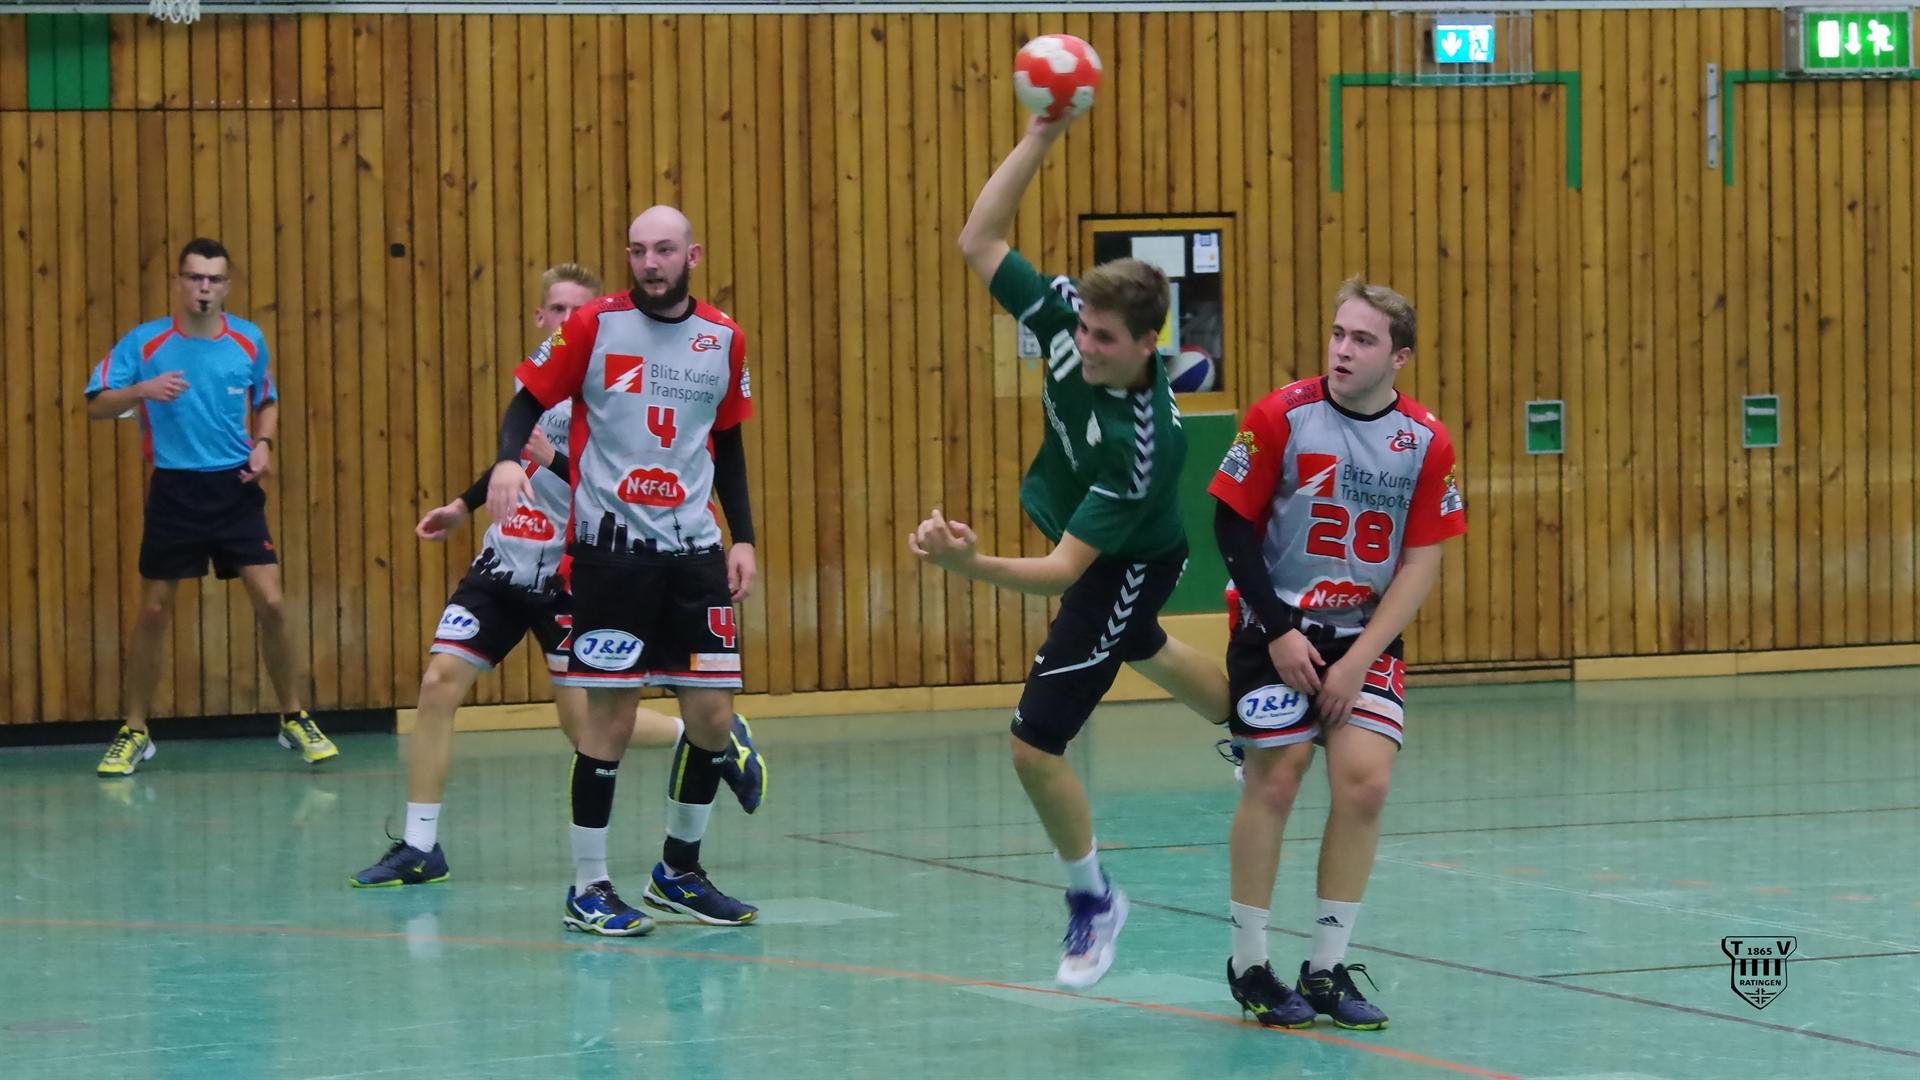 TV Ratingen Handballabteilung - 100 % Ratingen - 100 % ...